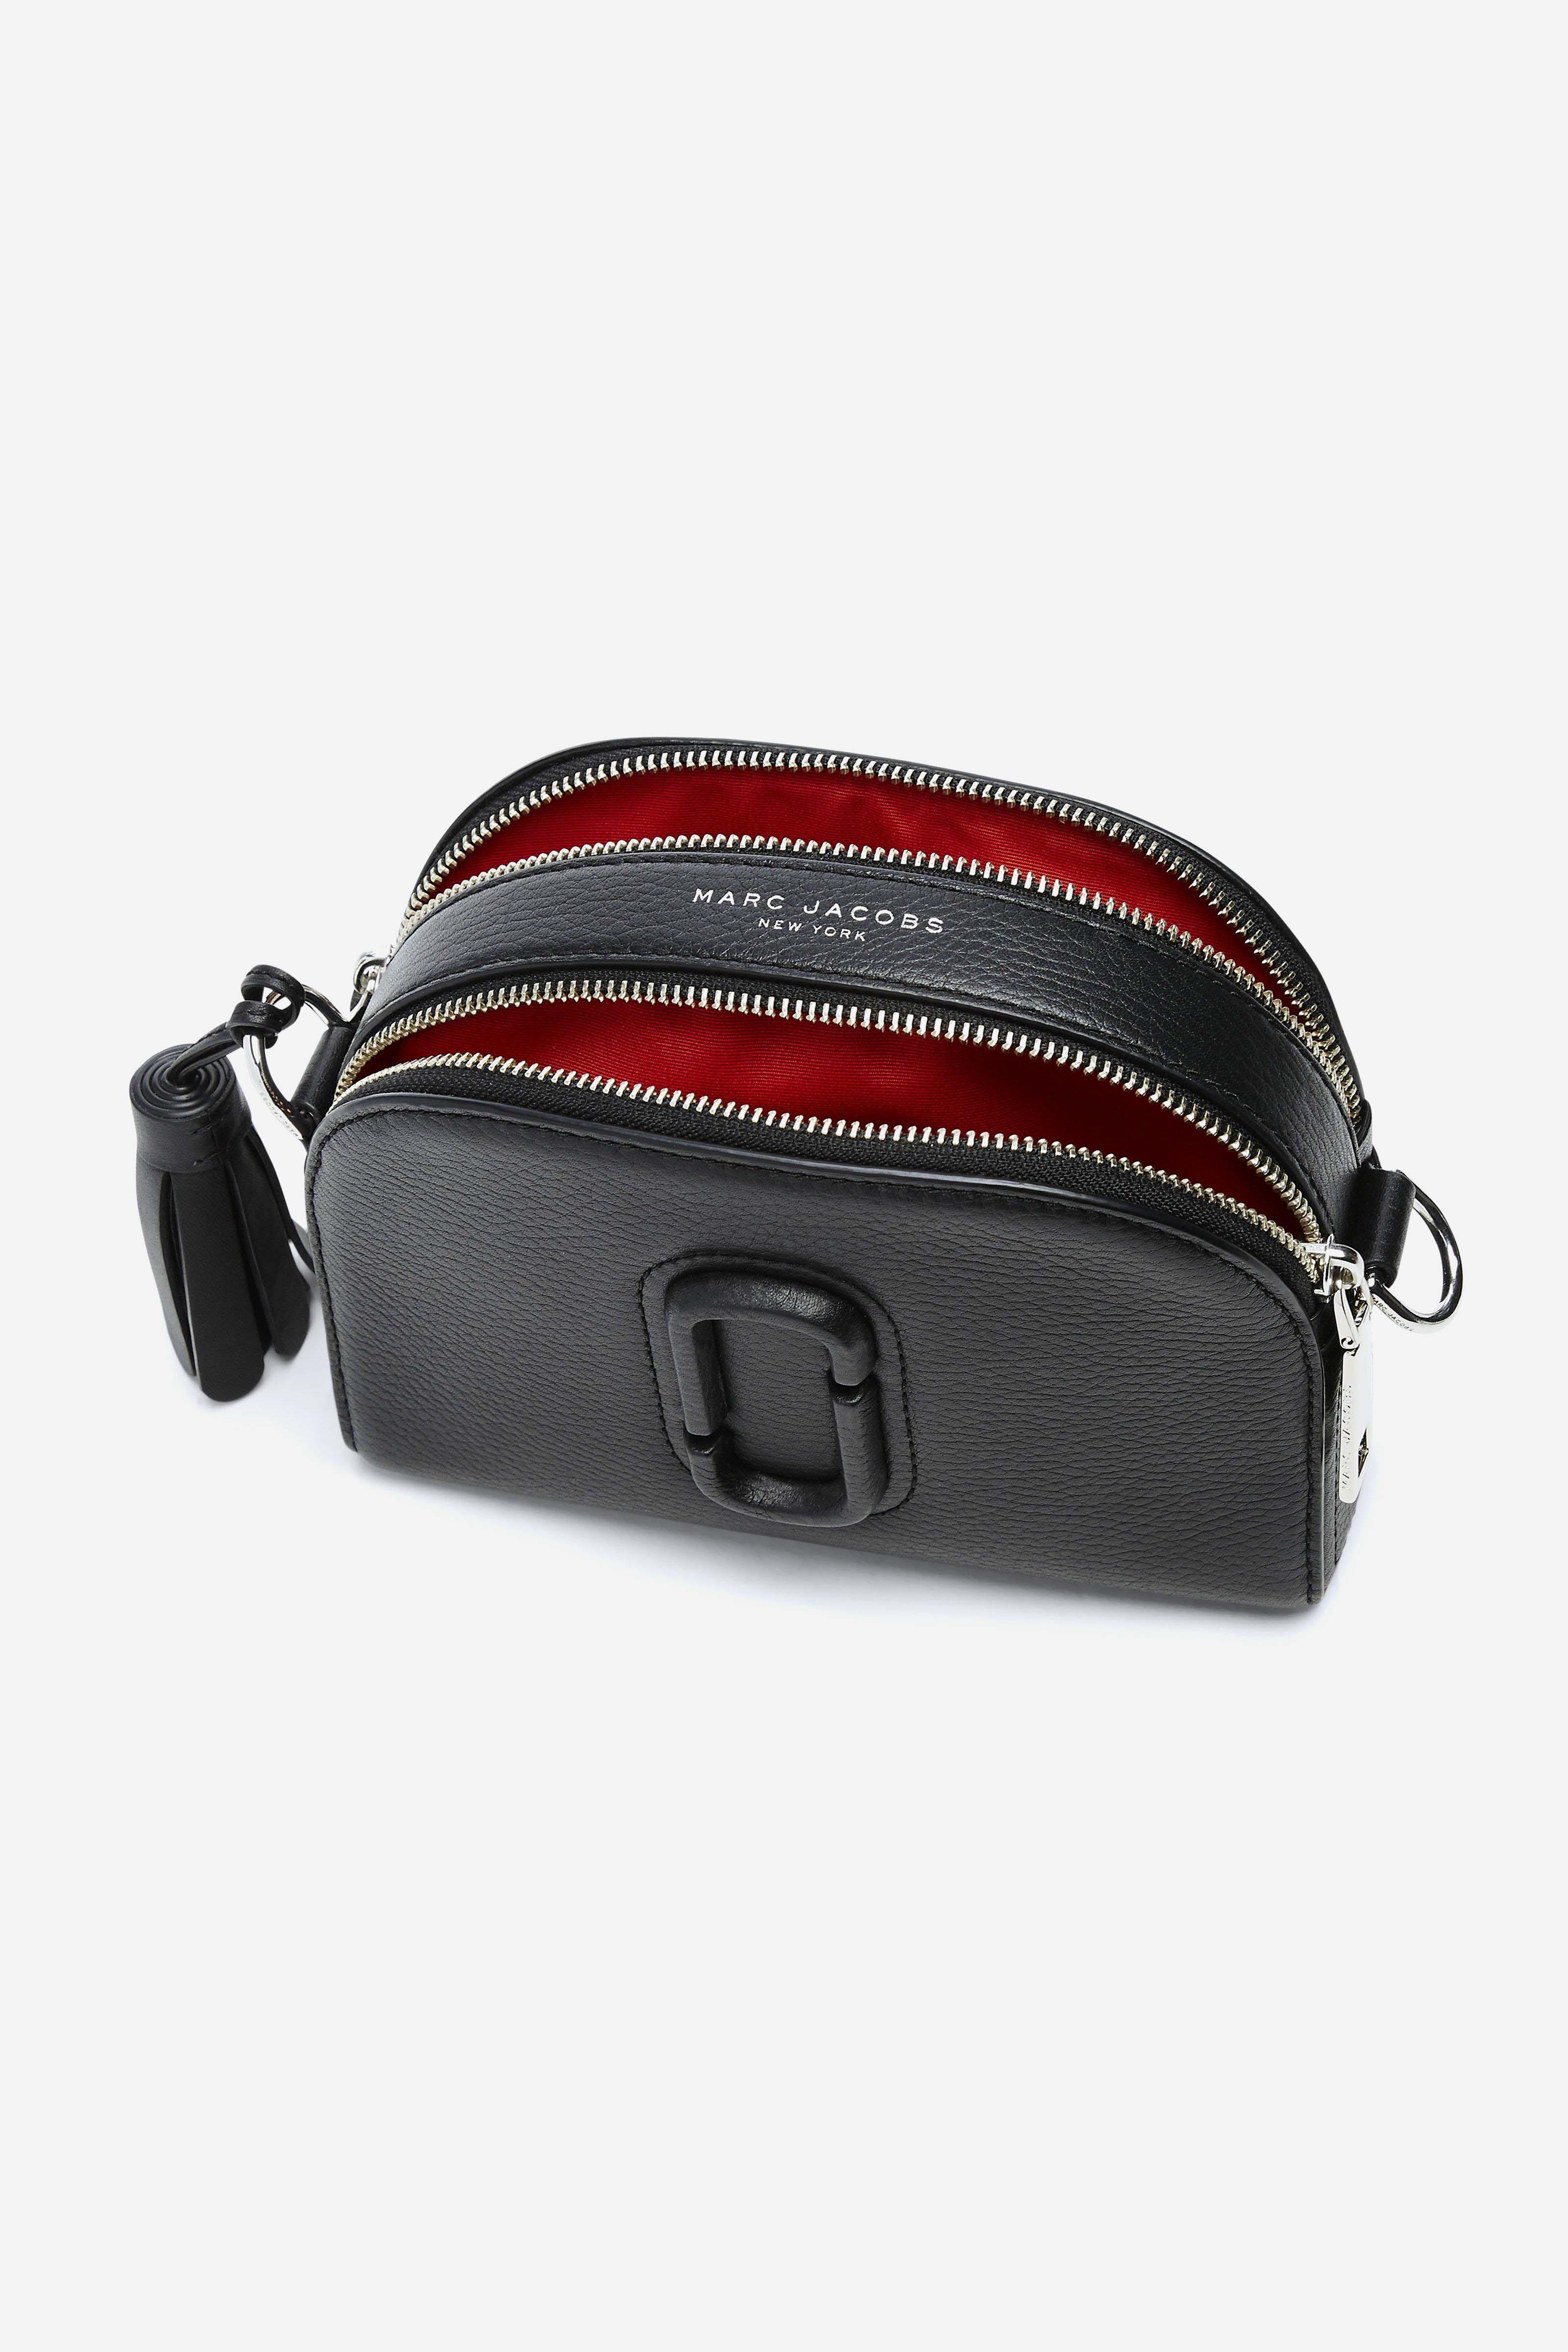 Marc Jacobs 26 - Shutter Small Camera Bag - Black